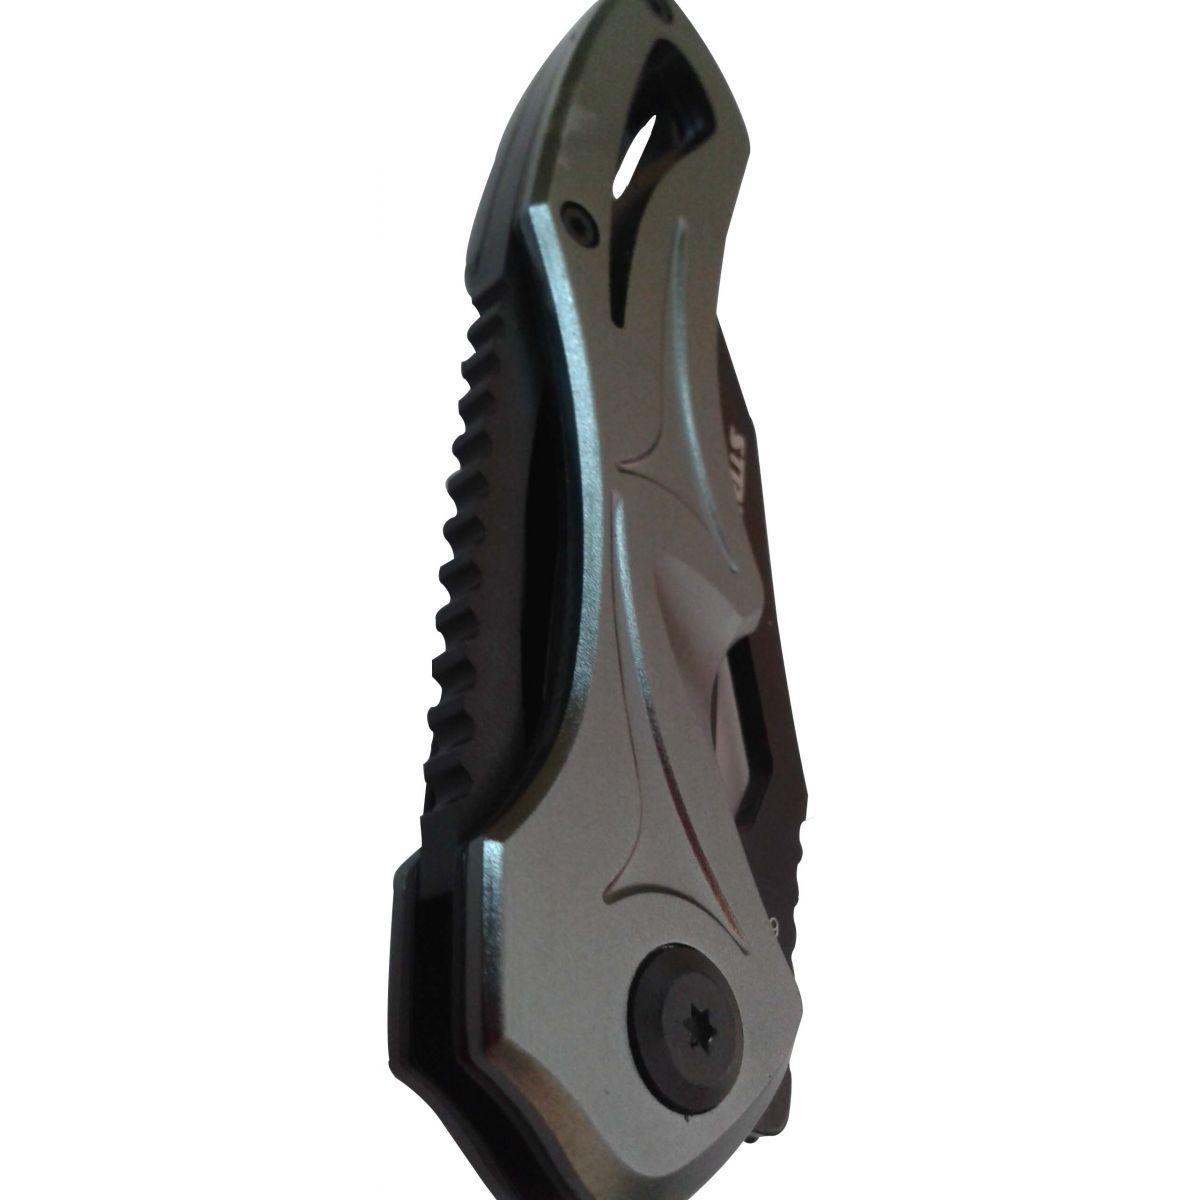 Canivete Stride Knives - Frete Grátis  - Thata Esportes